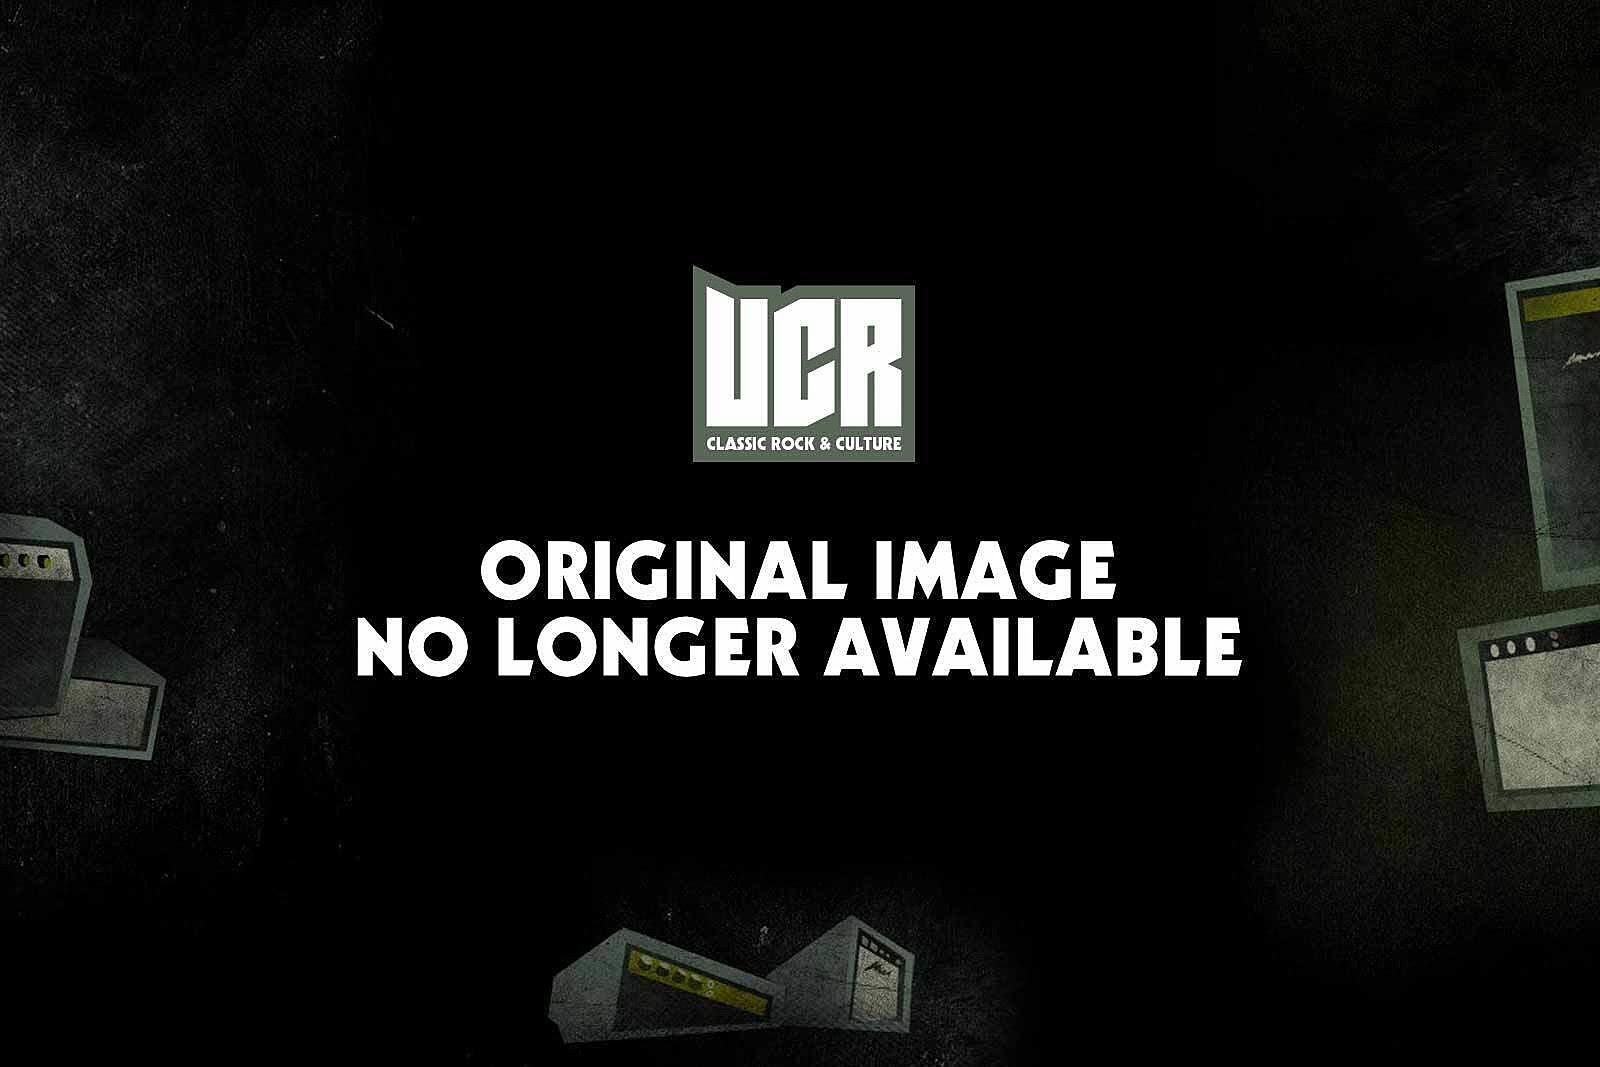 http://wac.450f.edgecastcdn.net/80450F/ultimateclassicrock.com/files/2012/08/The-Who-Eagle-Rock-Entertainment.jpeg